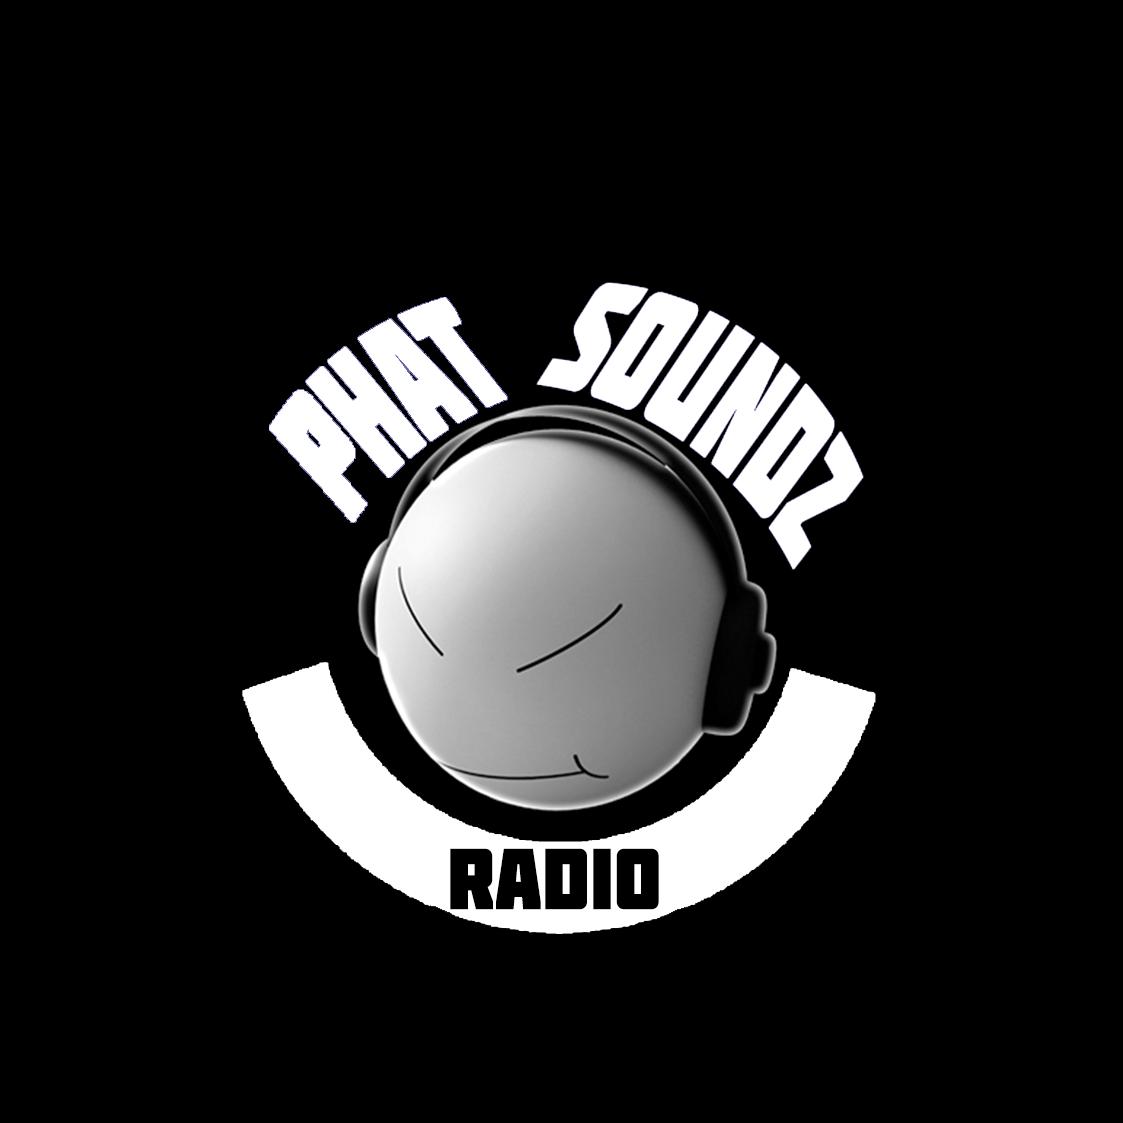 Phat Soundz